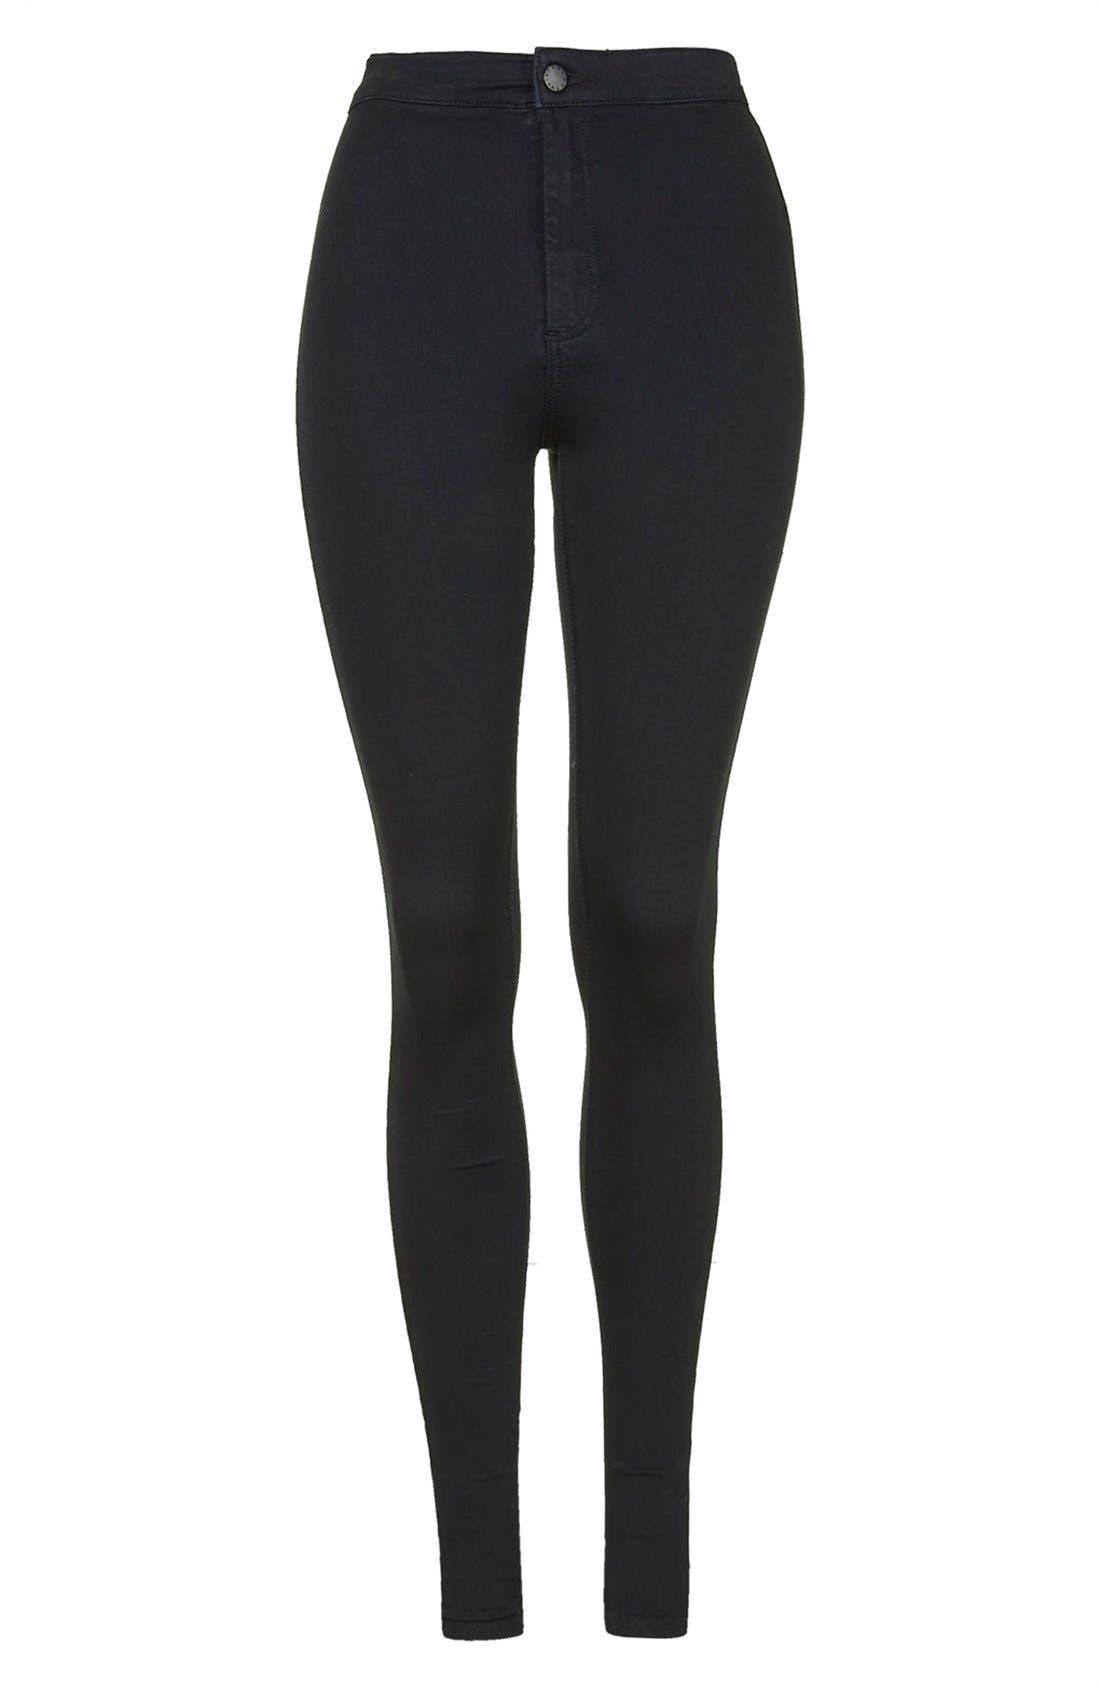 TOPSHOP, Joni High Waist Ankle Skinny Jeans, Alternate thumbnail 2, color, 001